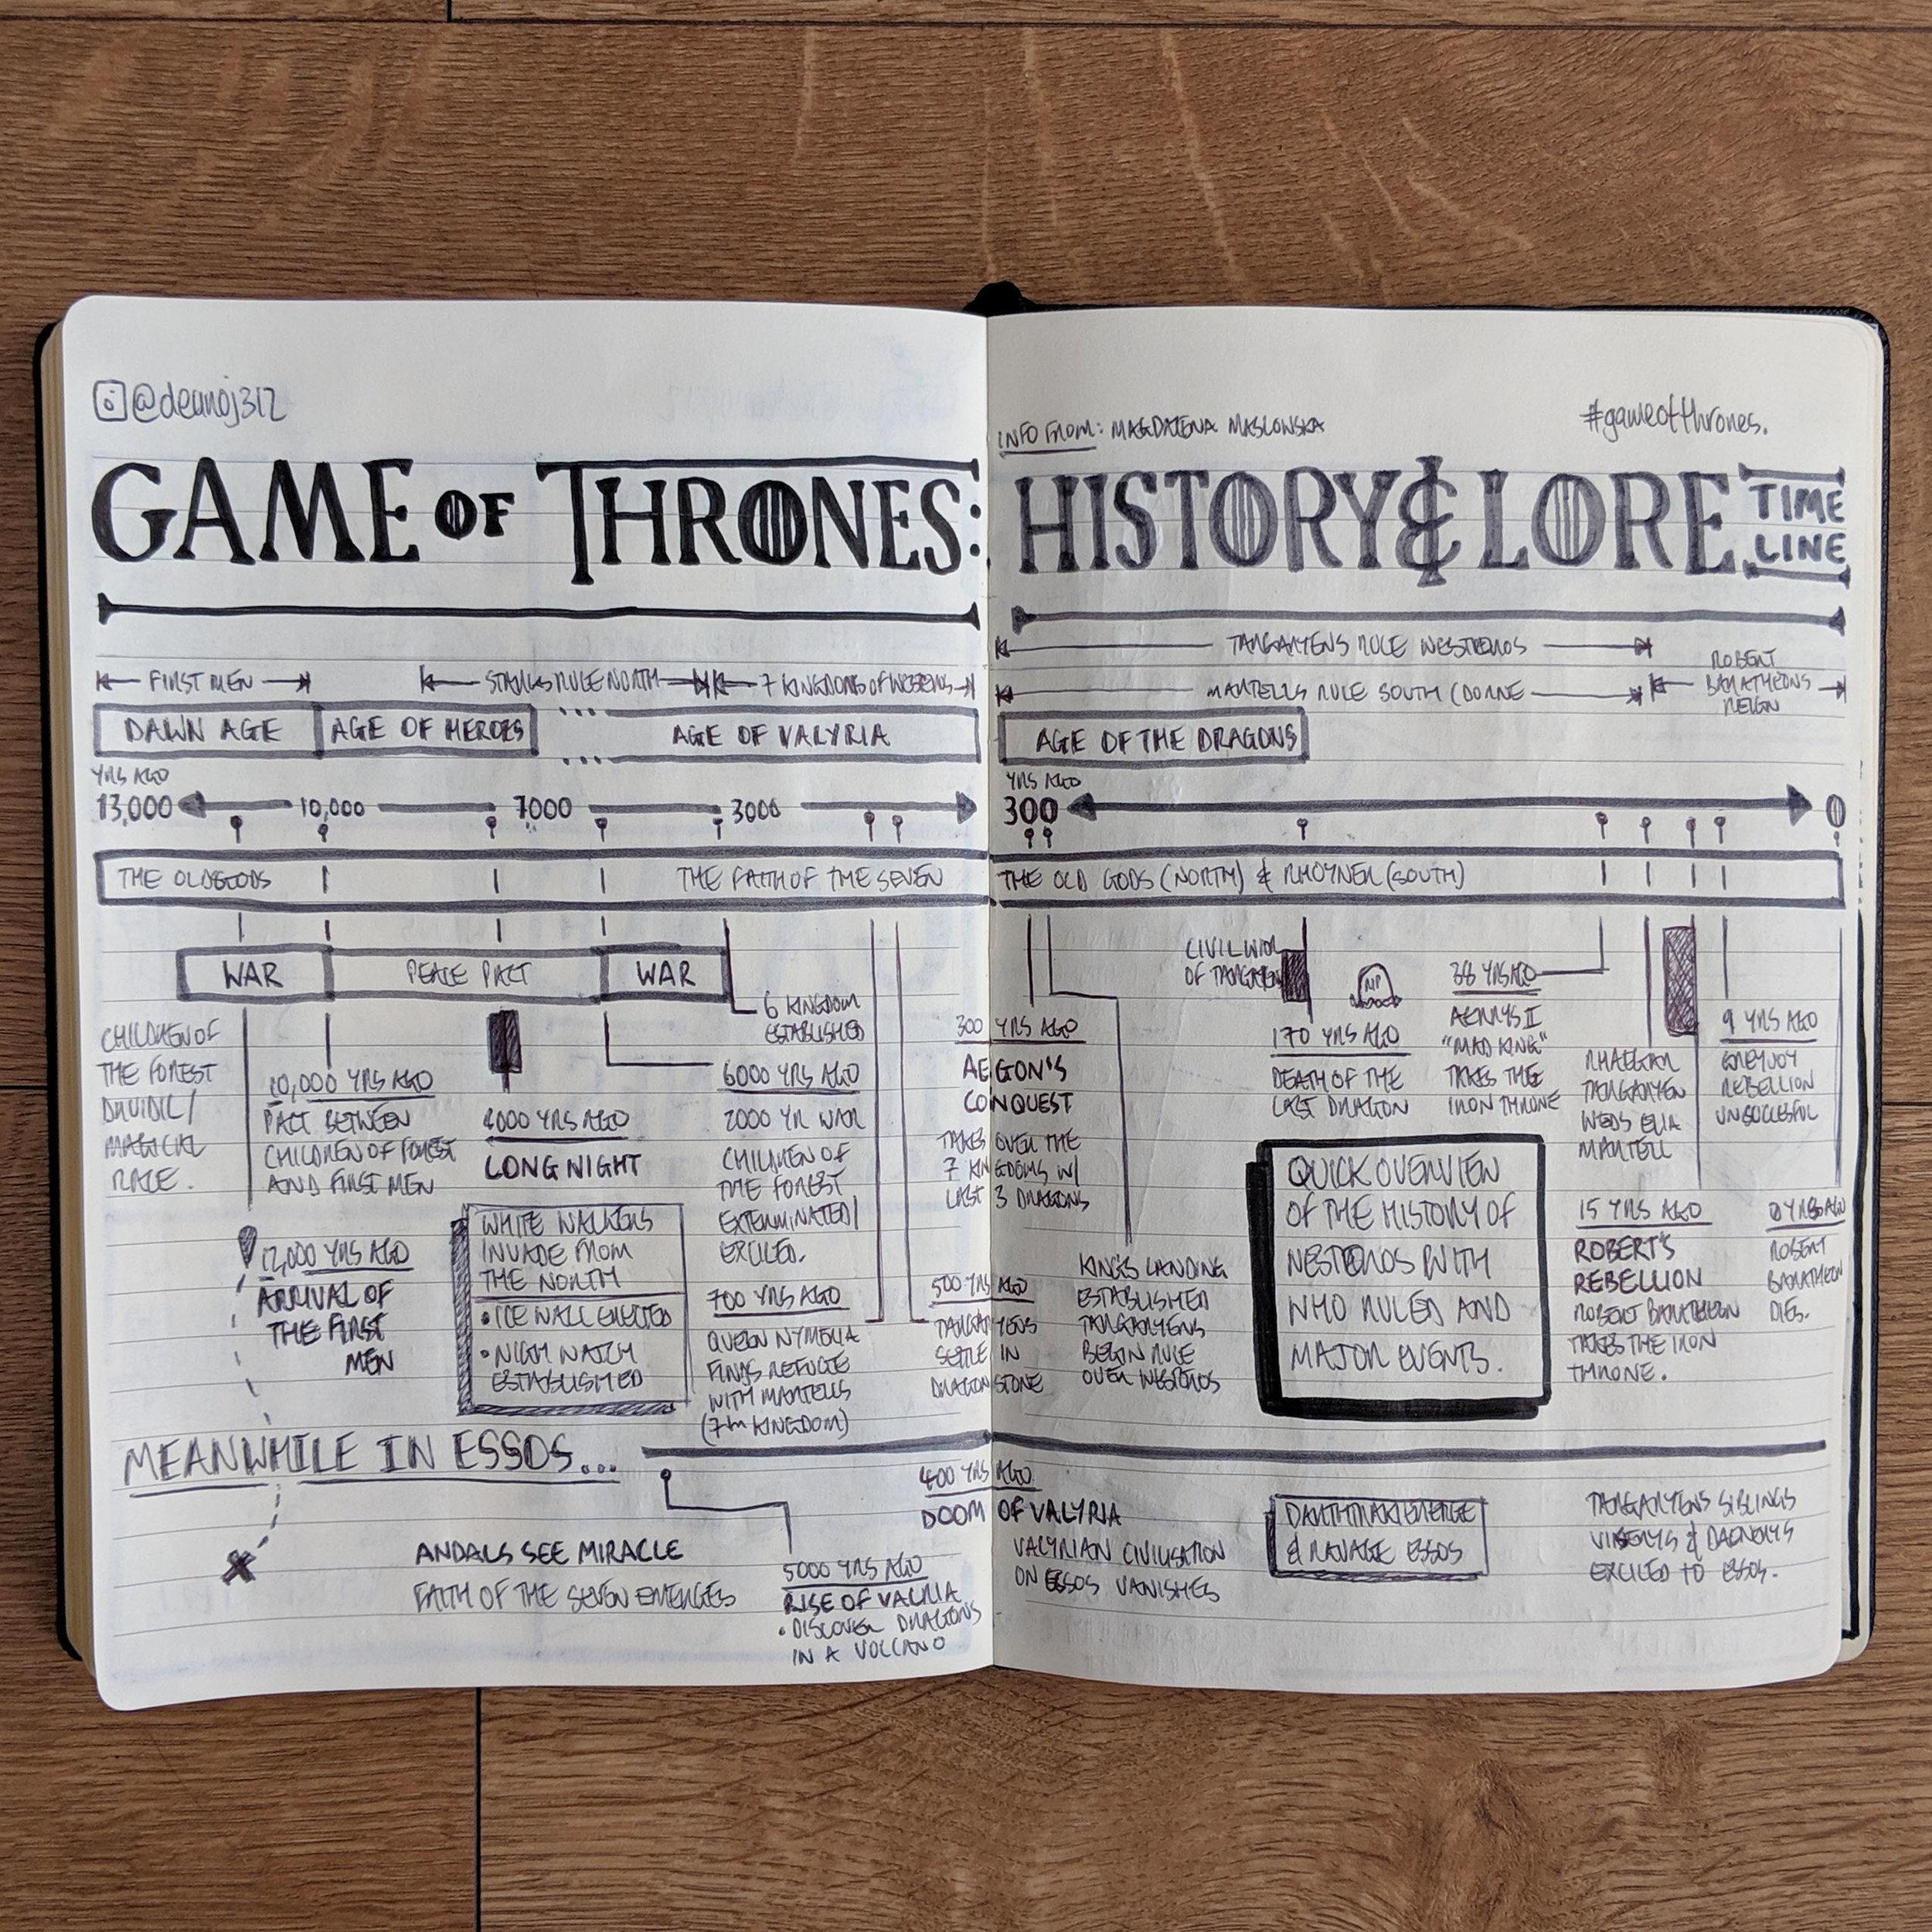 GoT-HistoryAndLore1.jpg